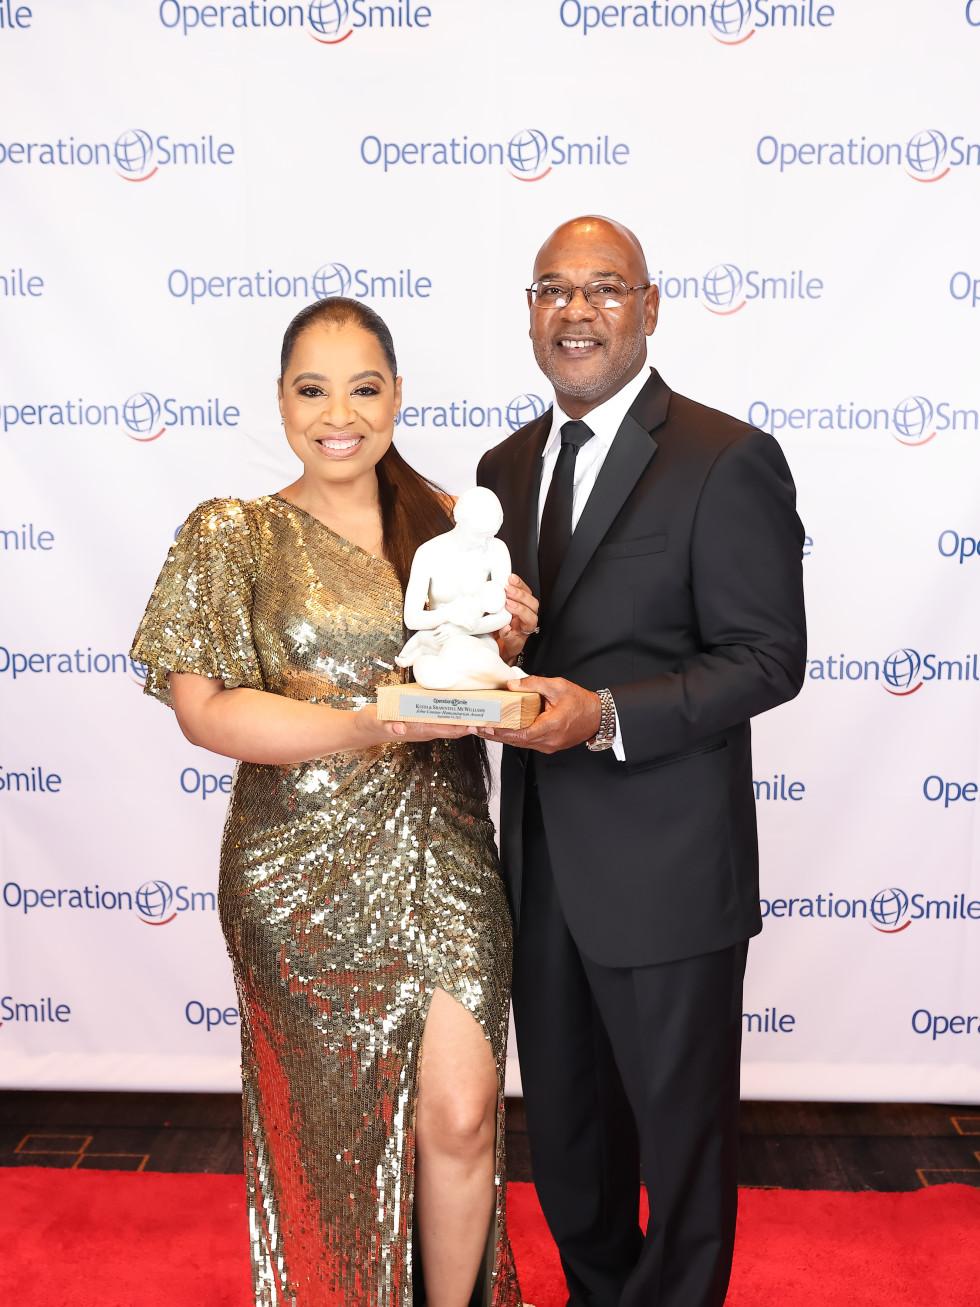 Operation Smile Gala 2021 04 John Connor Humanitarian Award recipients Shawntell and Keith McWilliams